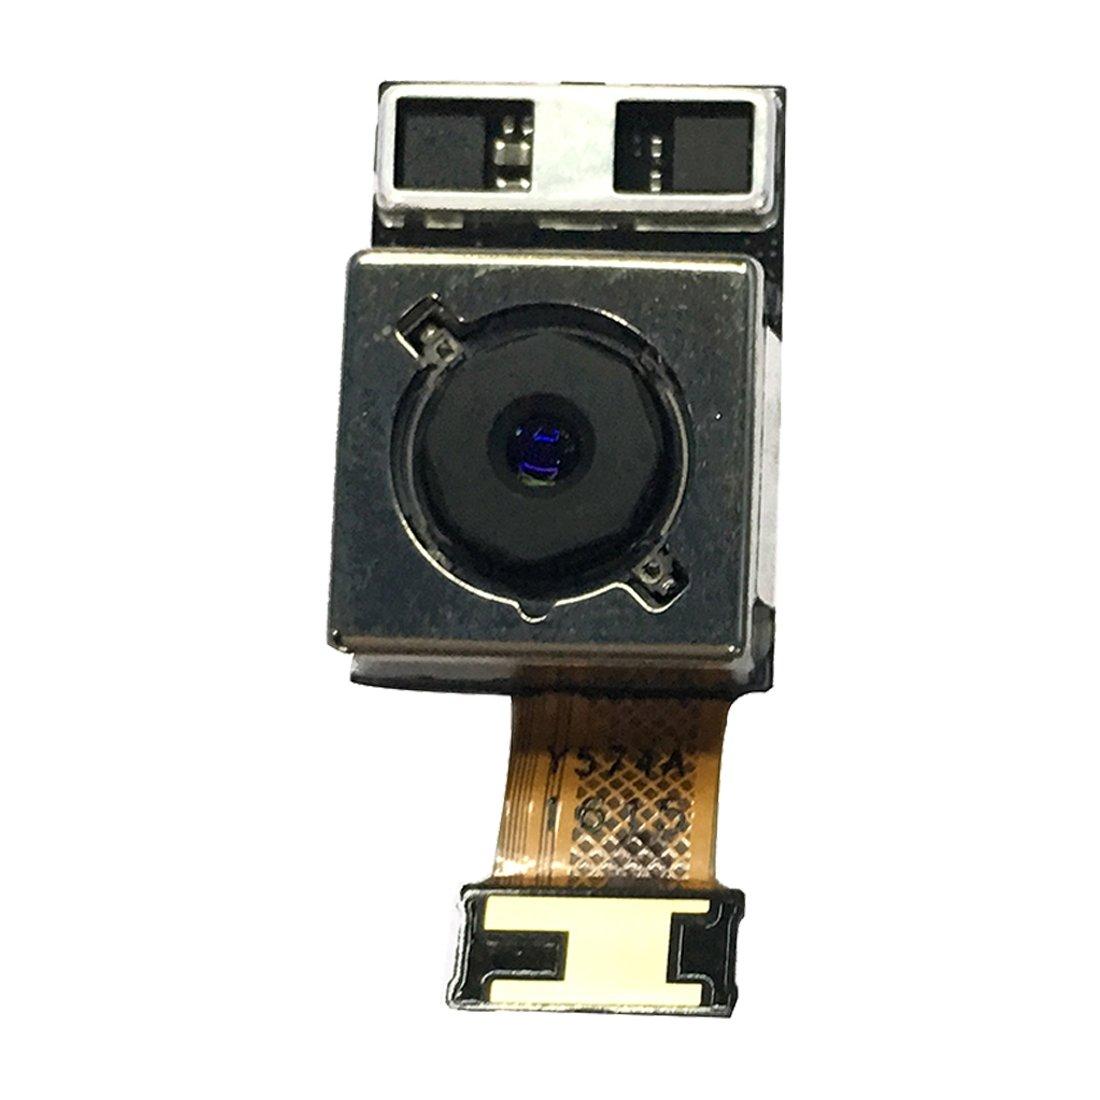 KANEED Camera Series Replacement Parts, Back Facing Big Camera for LG G5 / H850 / H820 / H830 / H831 / H840 / RS988 / US992 / LS992